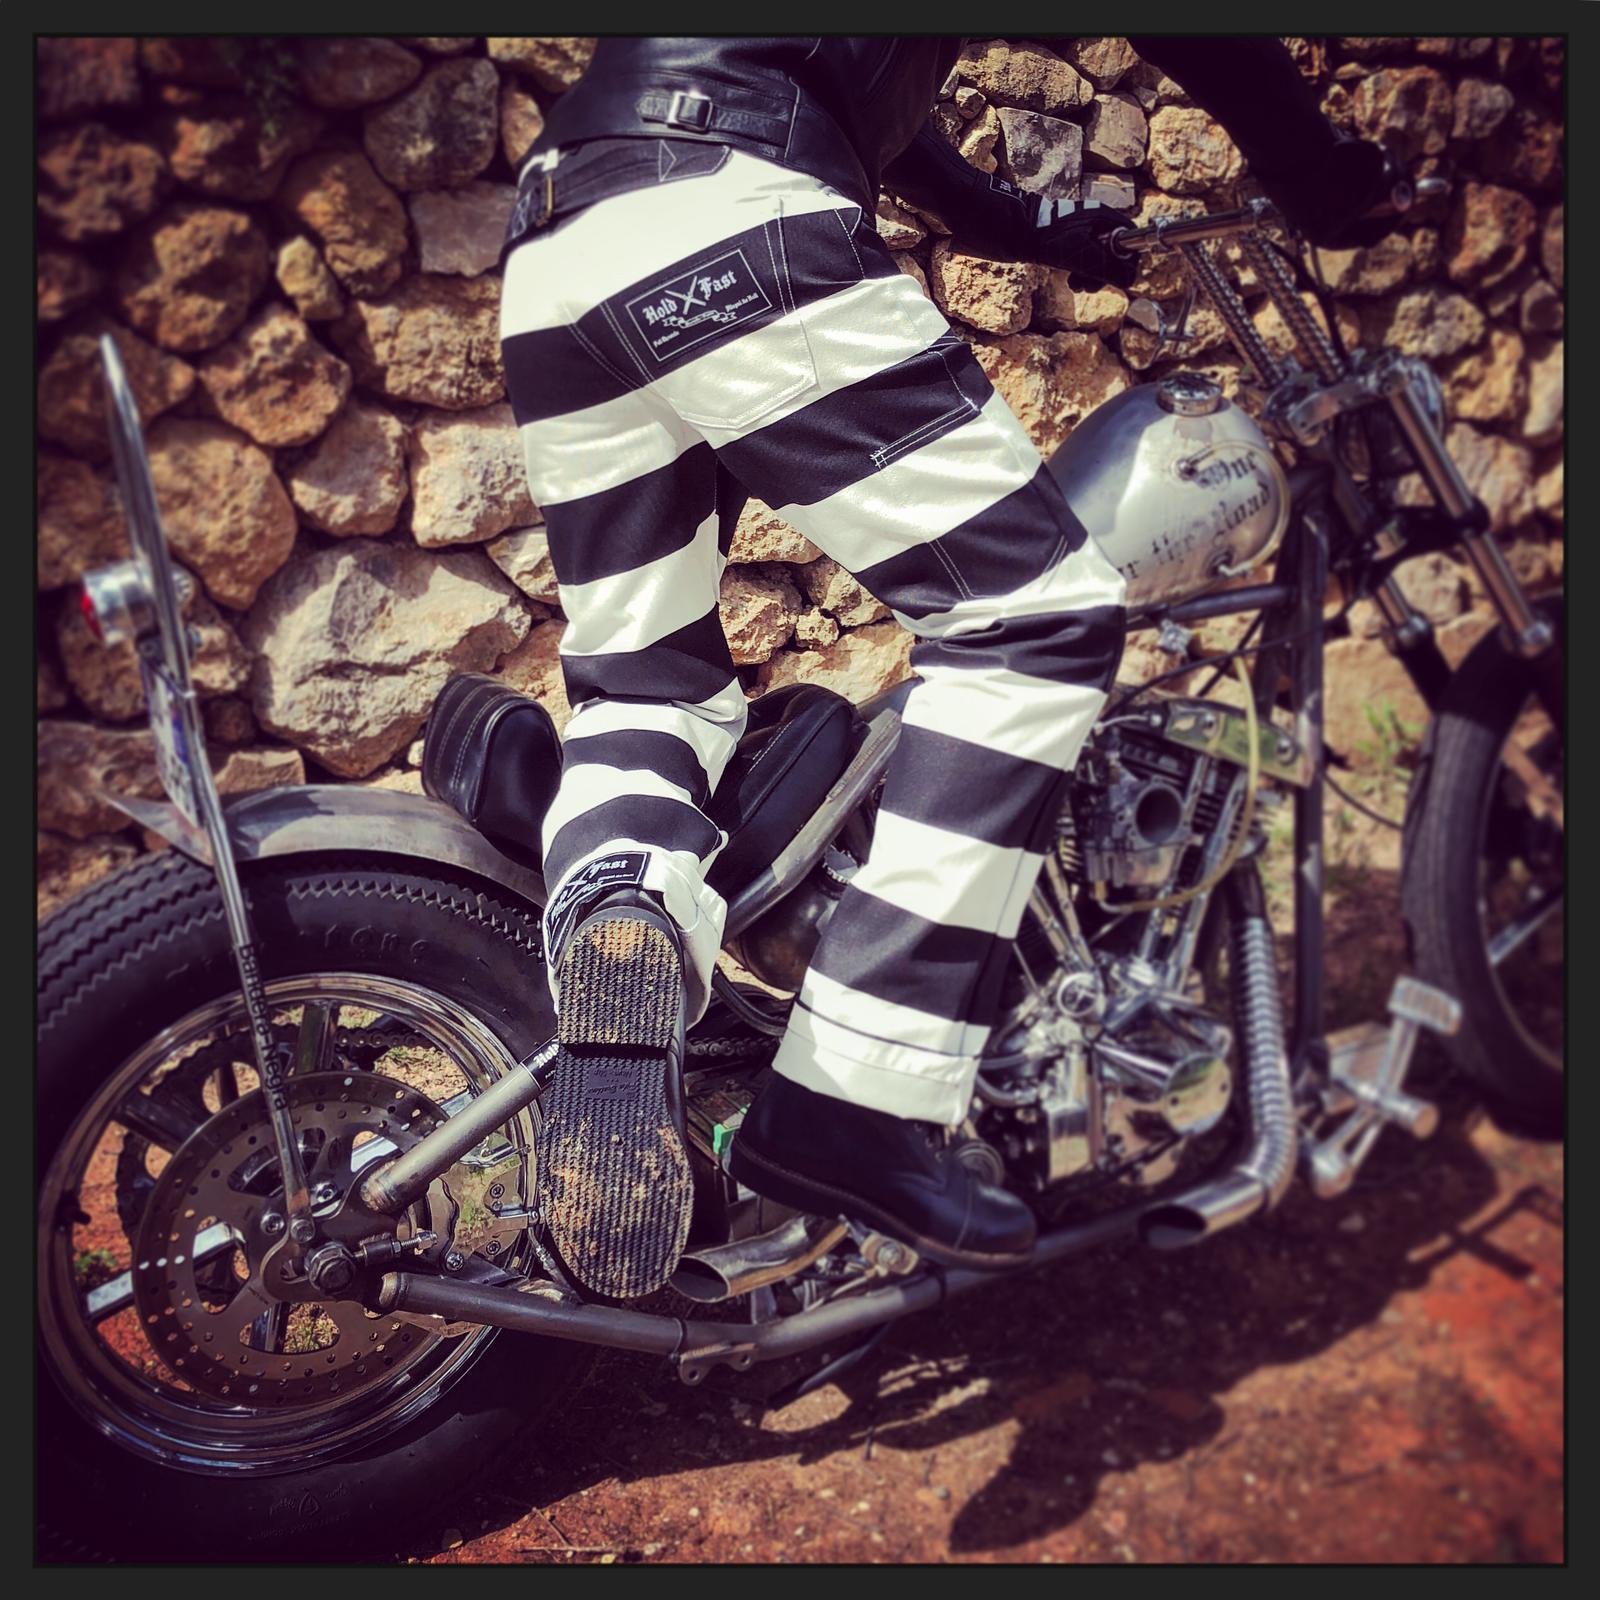 pantalon-bagnard-prisonnier-holdfast-kick